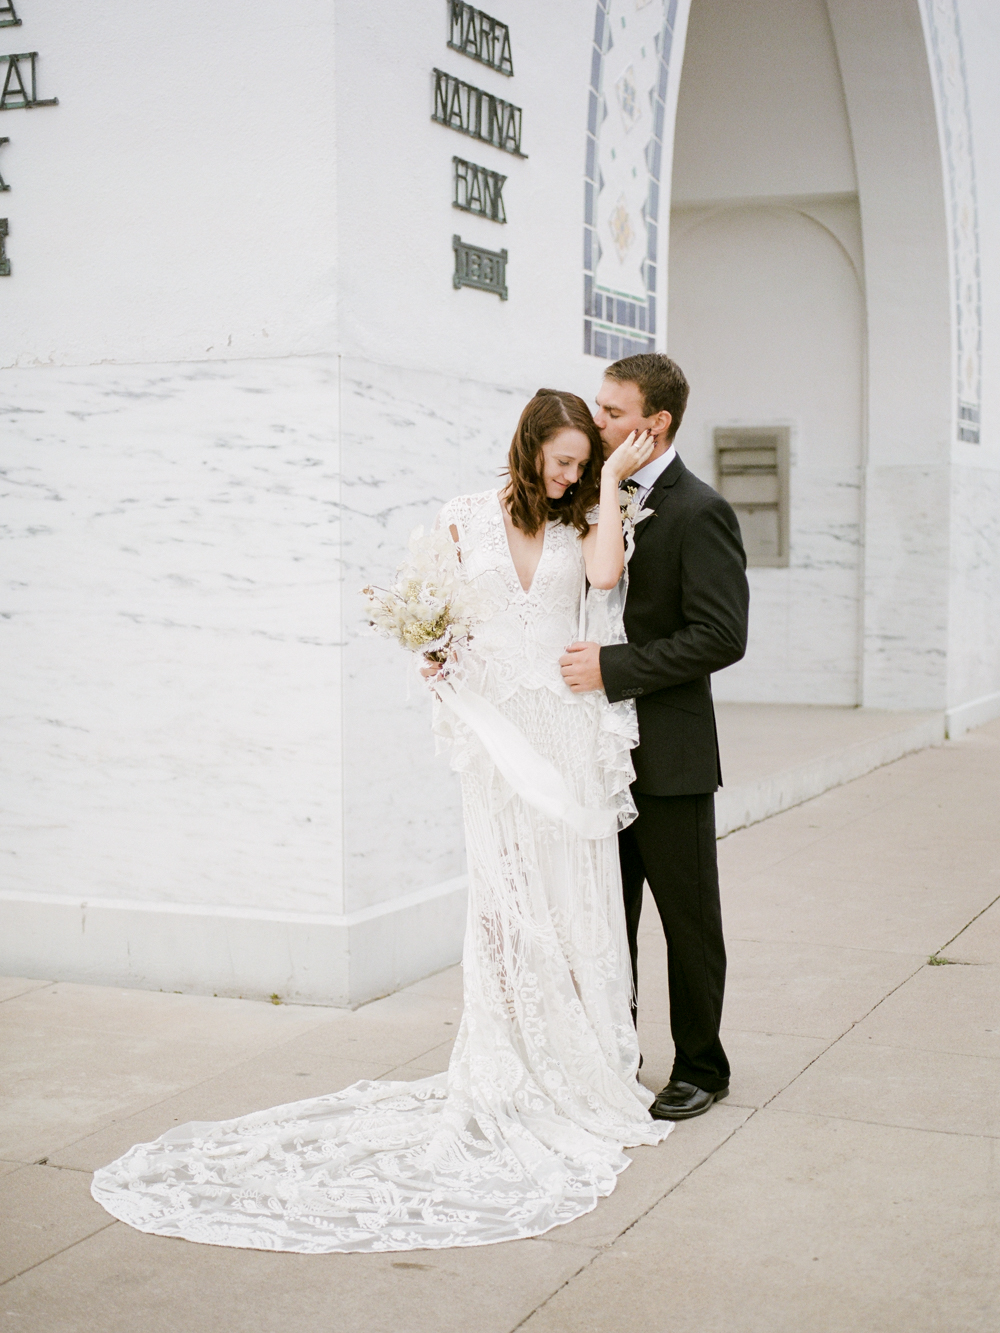 Marfa wedding photographer- destination wedding photographer-christine gosch - film photographer - elopement photographer-12.jpg